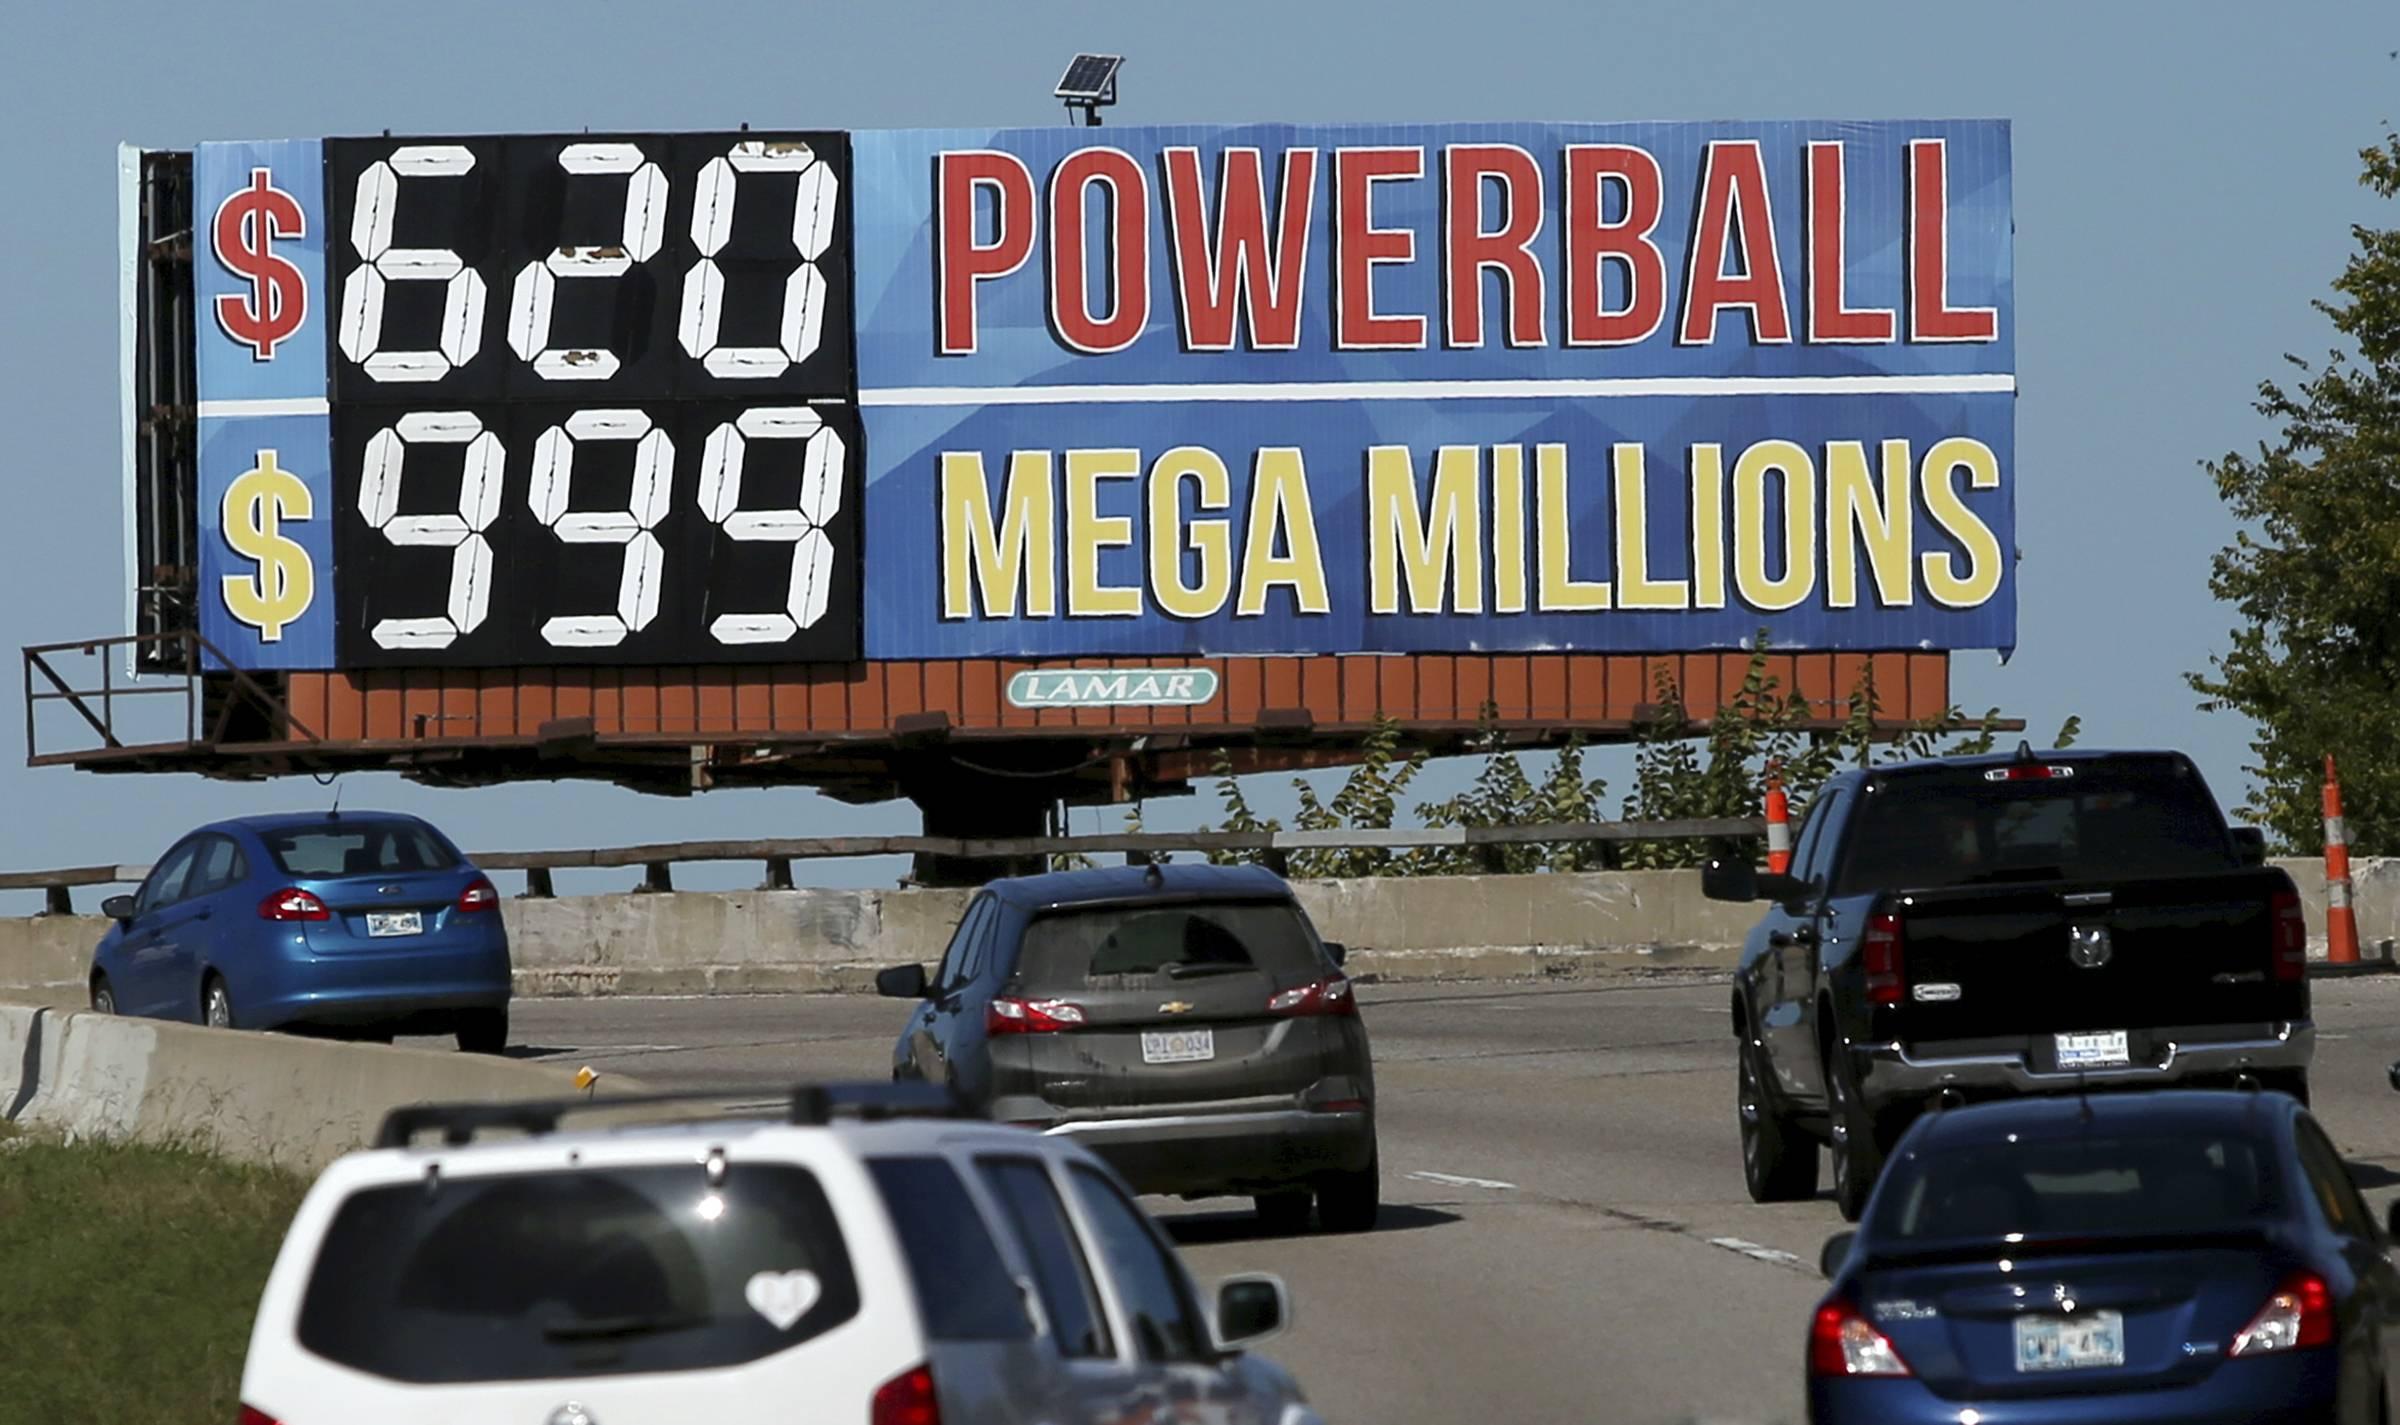 A Mega Millions Winner In Rural South Carolina Landed A Massive